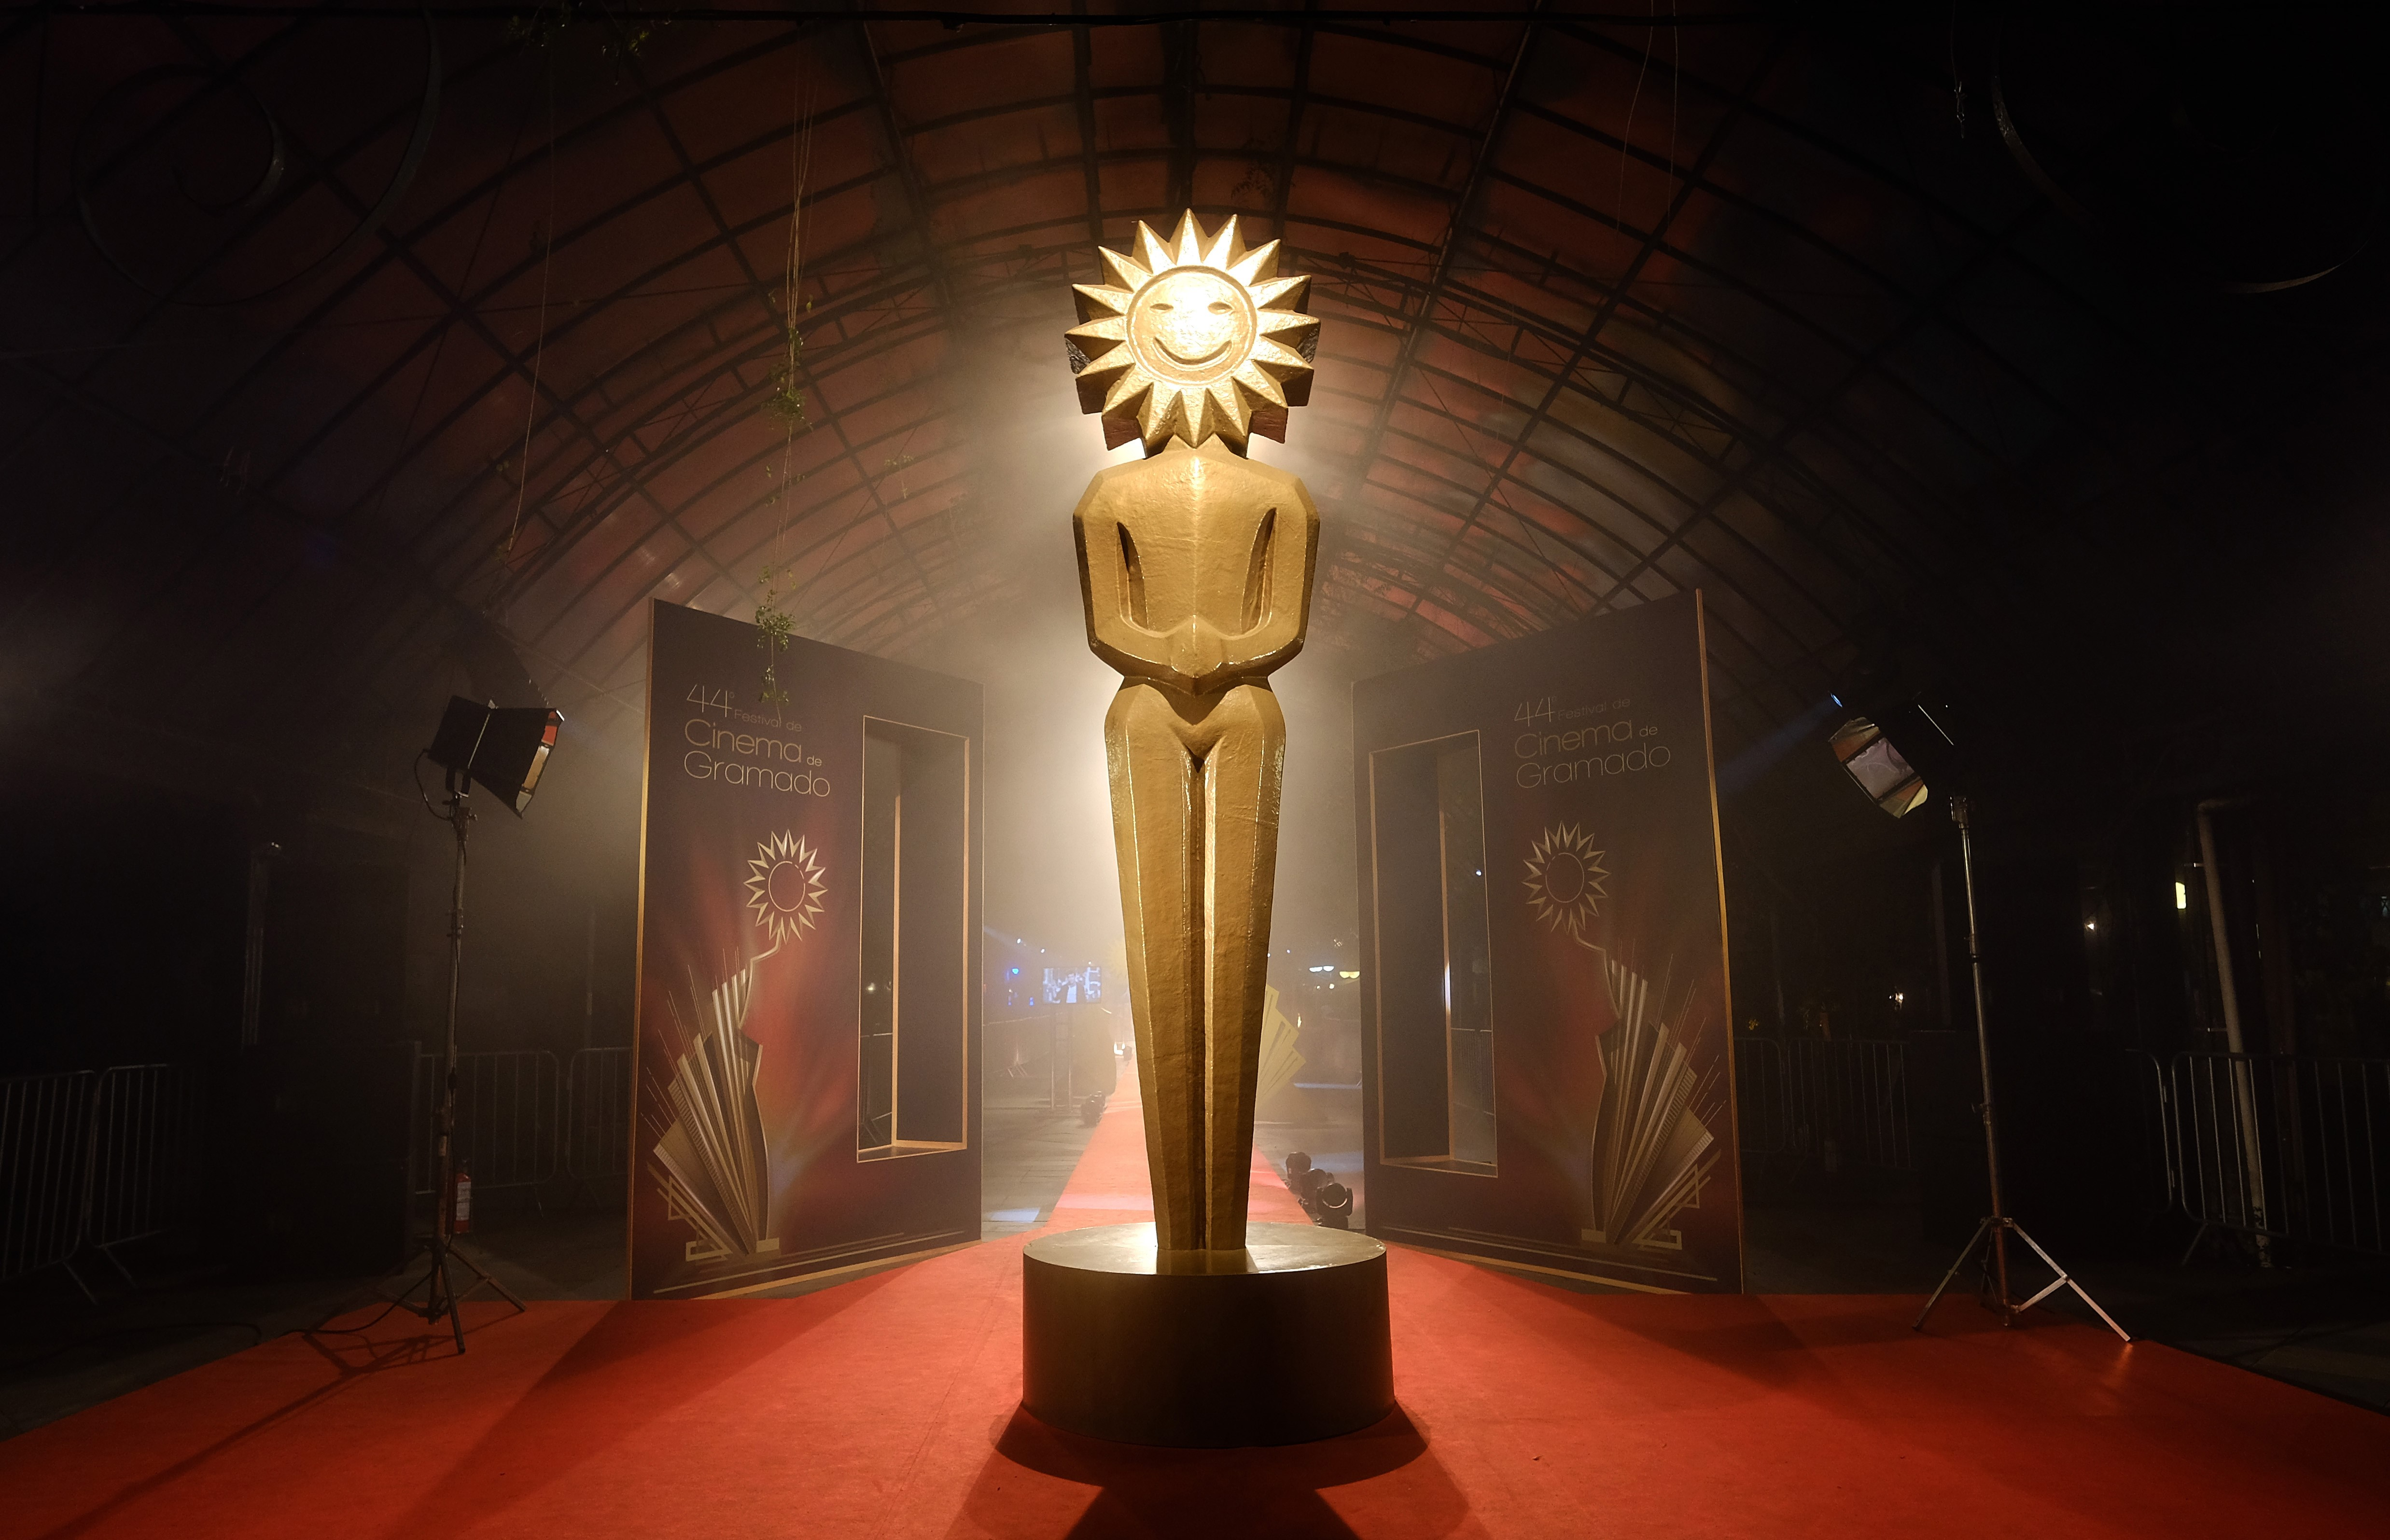 Festival de Cinema de Gramado